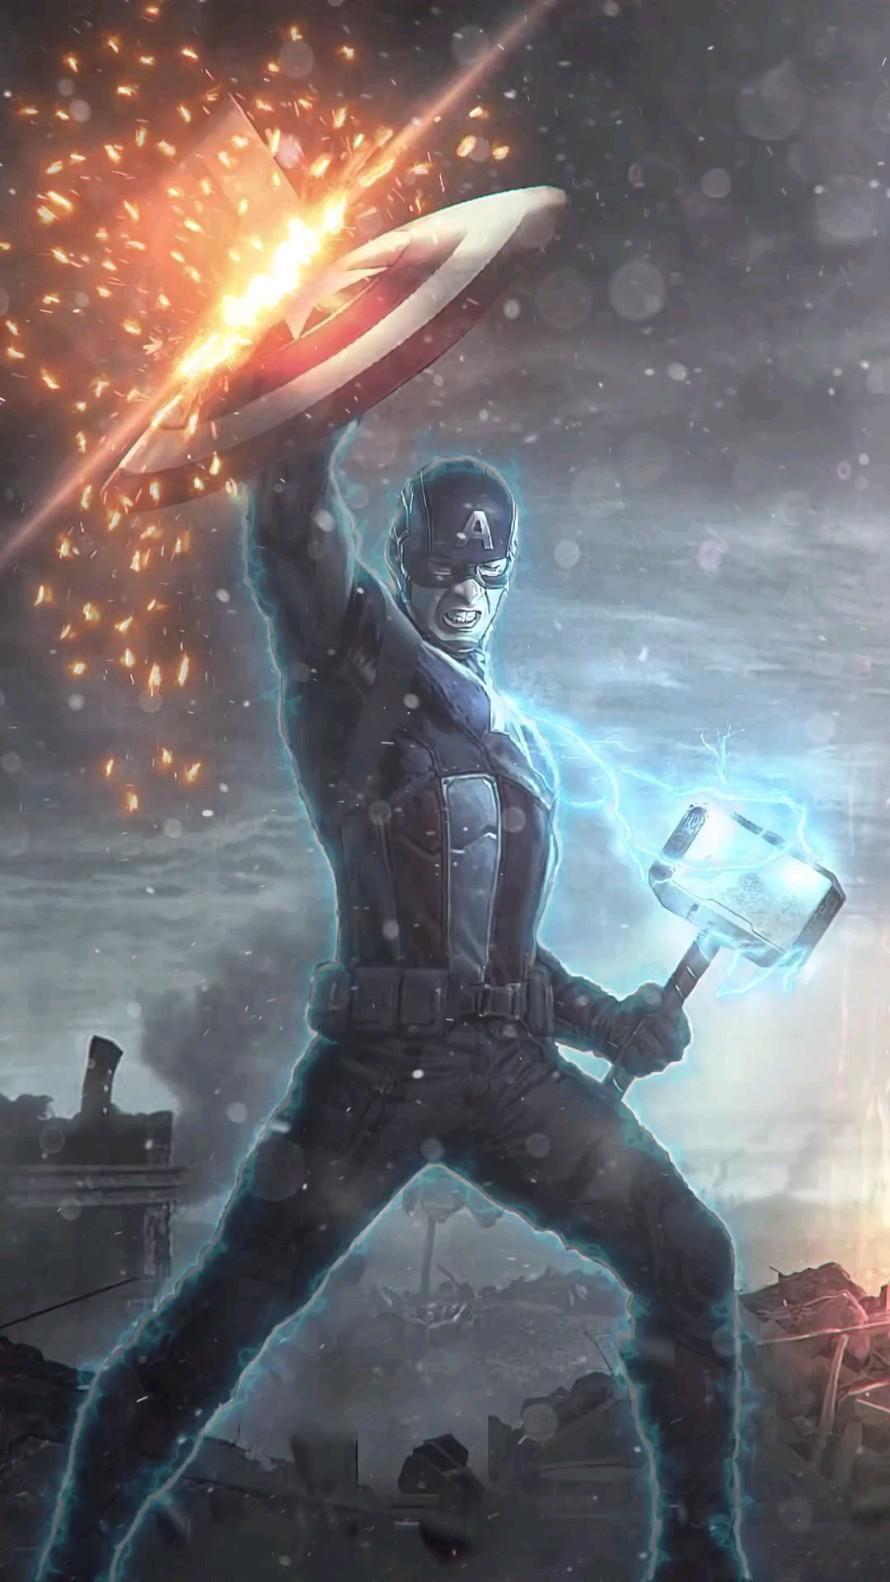 Captain America Animated Video GIF Phone Wallpaper Captain America #CaptainAmerica #wallpaper #gif